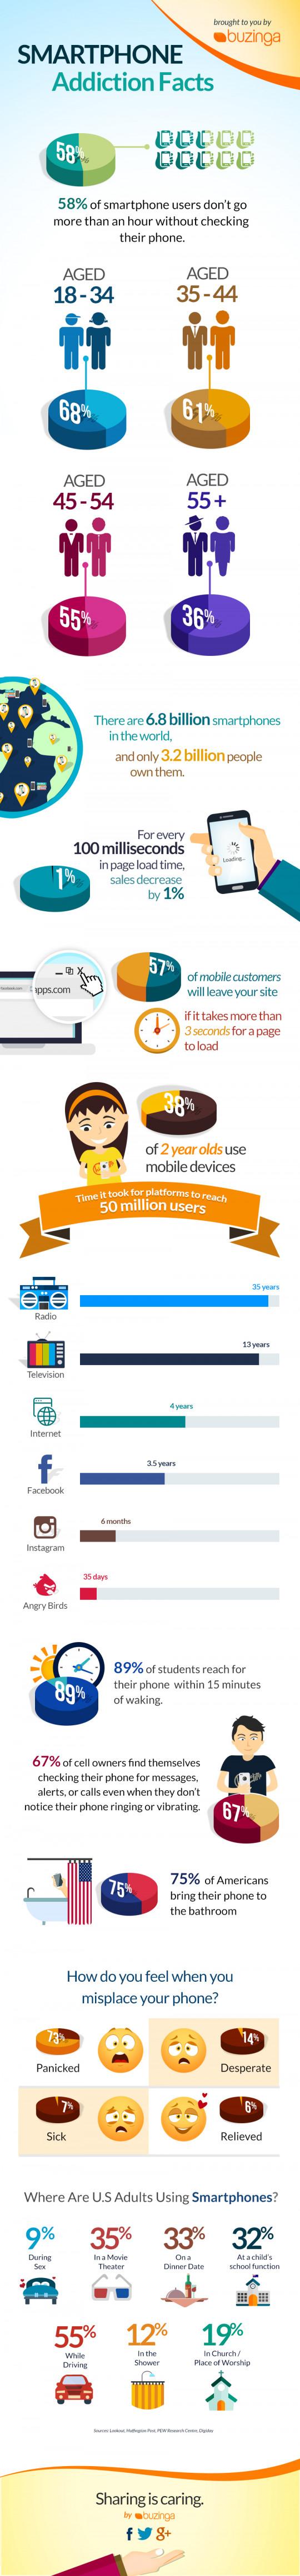 Smartphone Addiction Facts